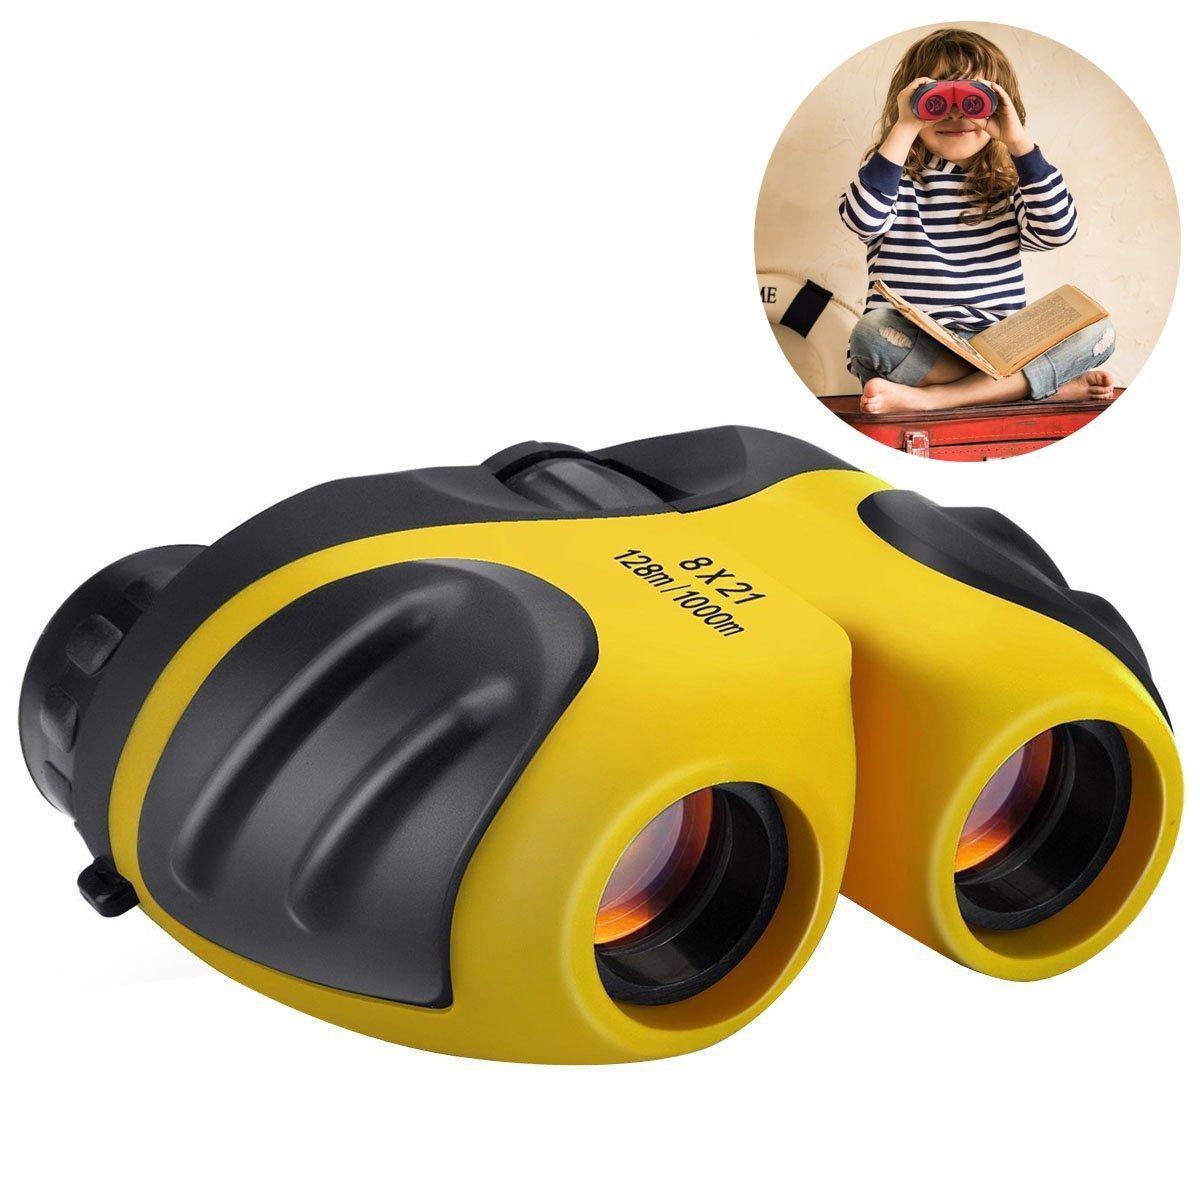 Happyギフトコンパクト耐衝撃8 x 21 Kids binoculars- Best Gifts For Boys And Girls B0797TKK4P  イエロー